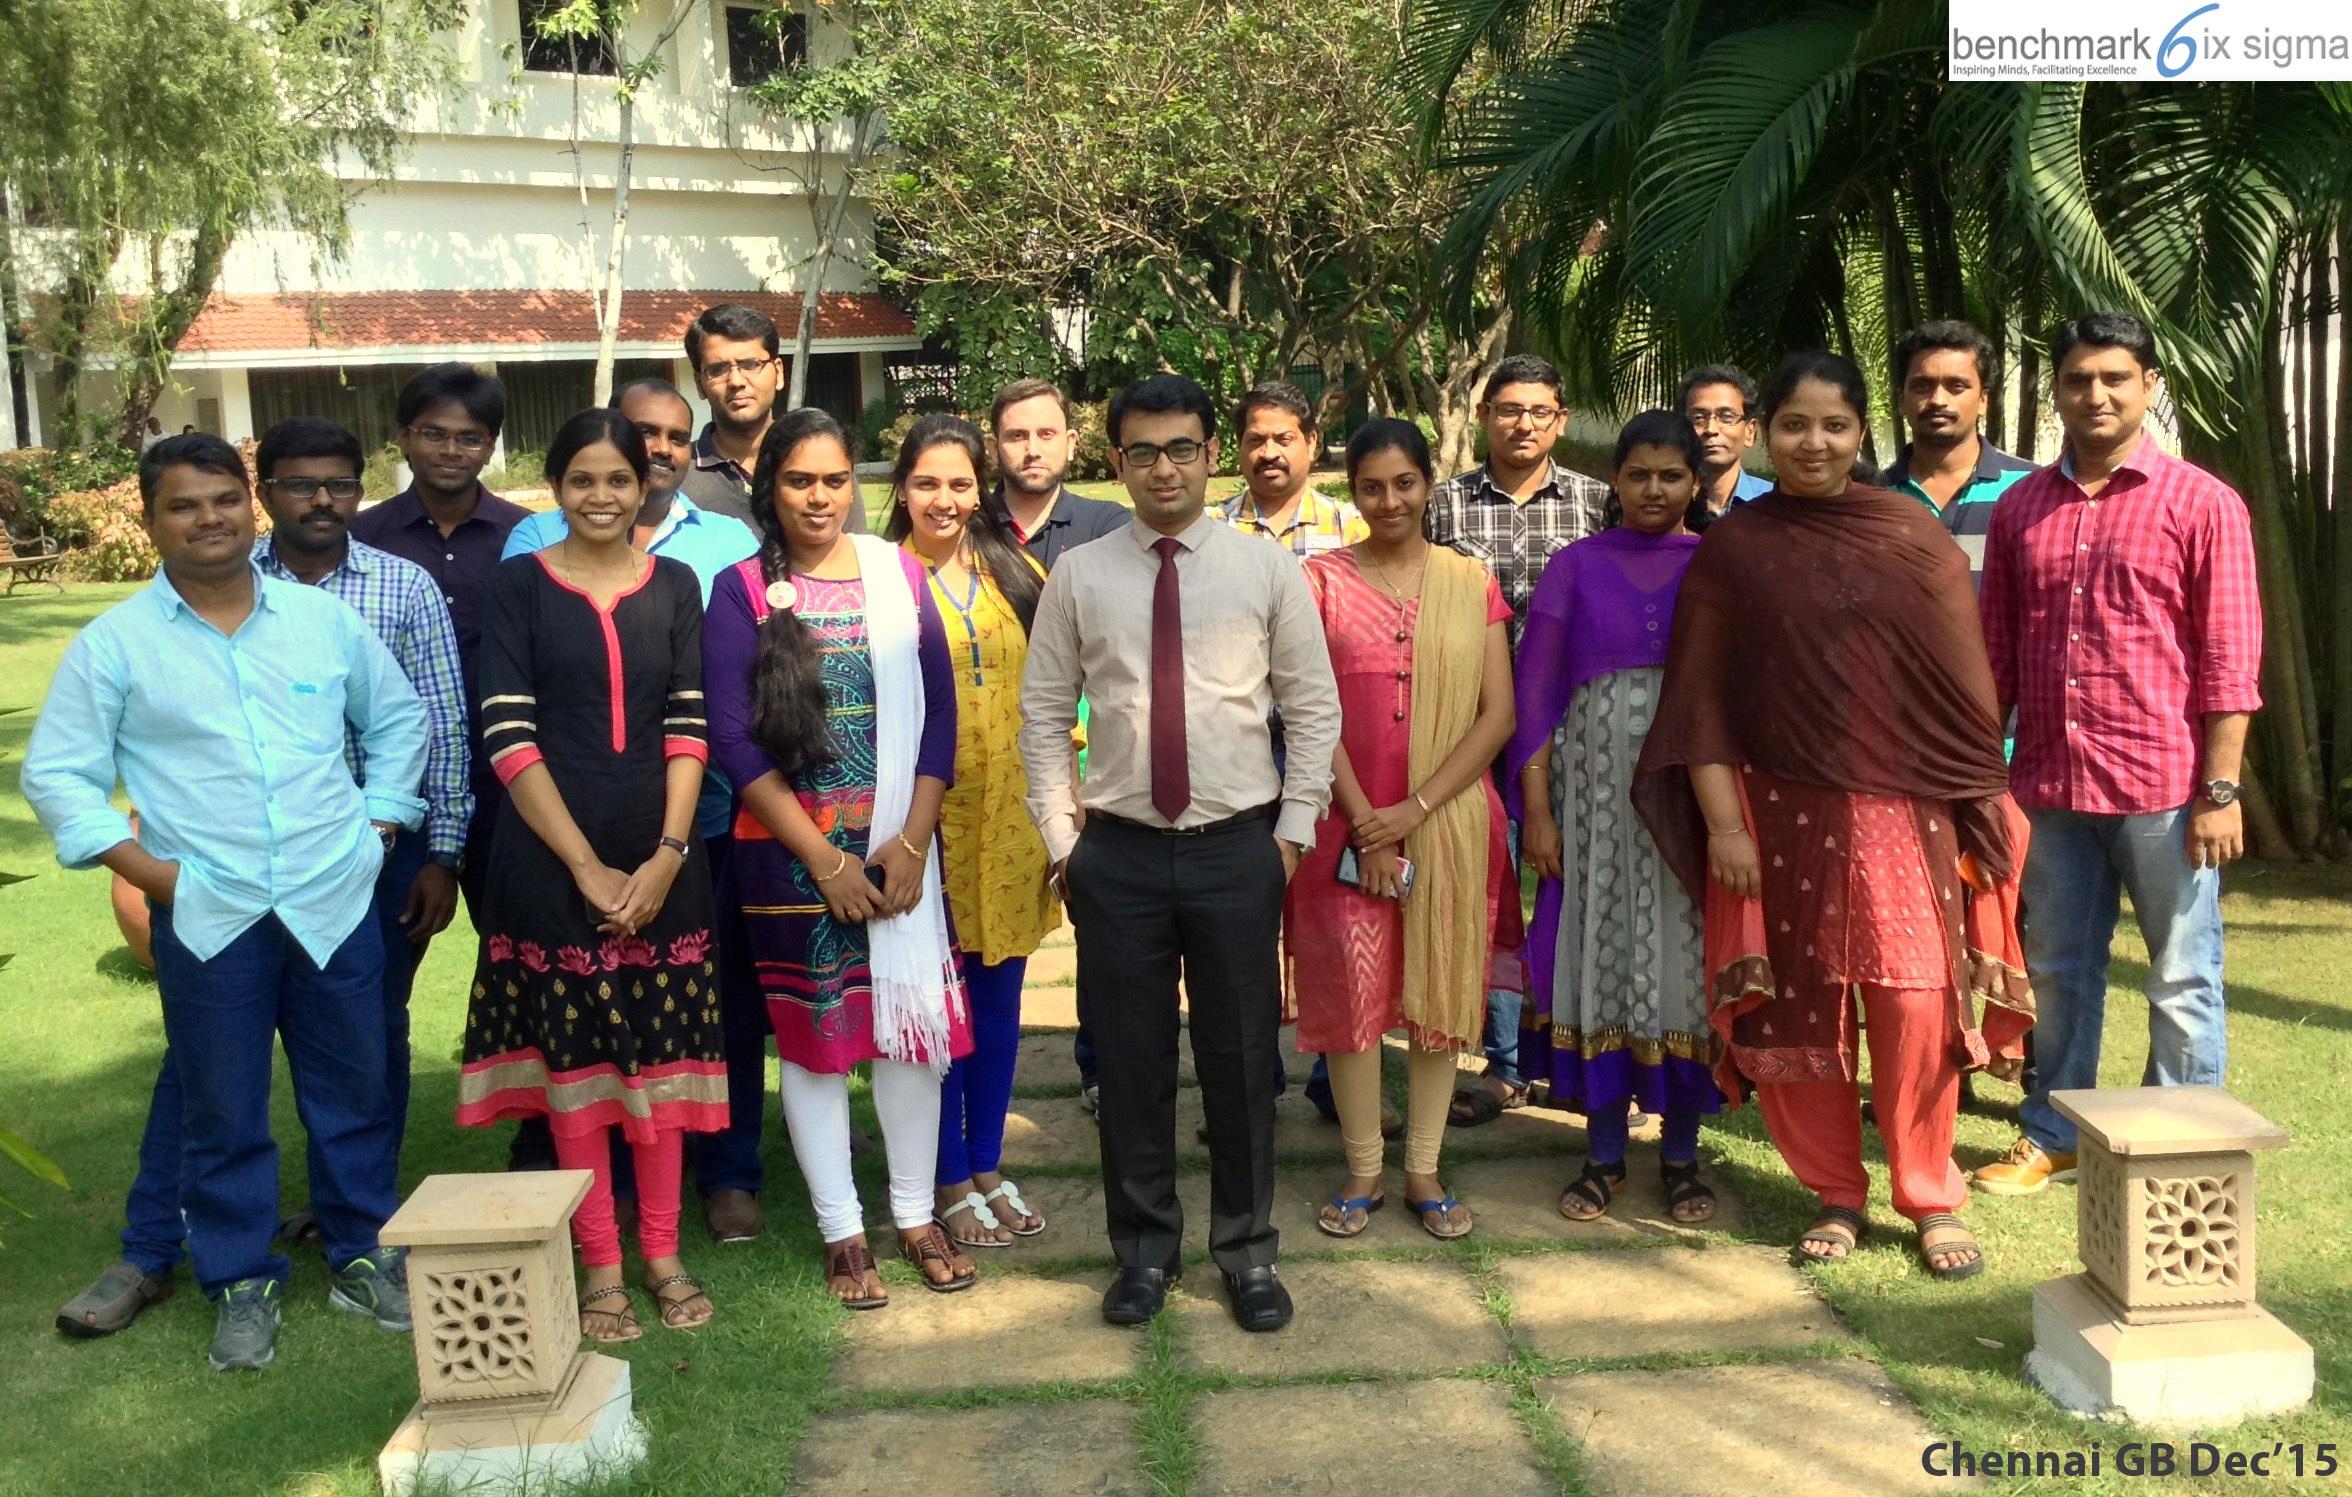 Benchmark Six Sigma Green Belt At Chennai Lea